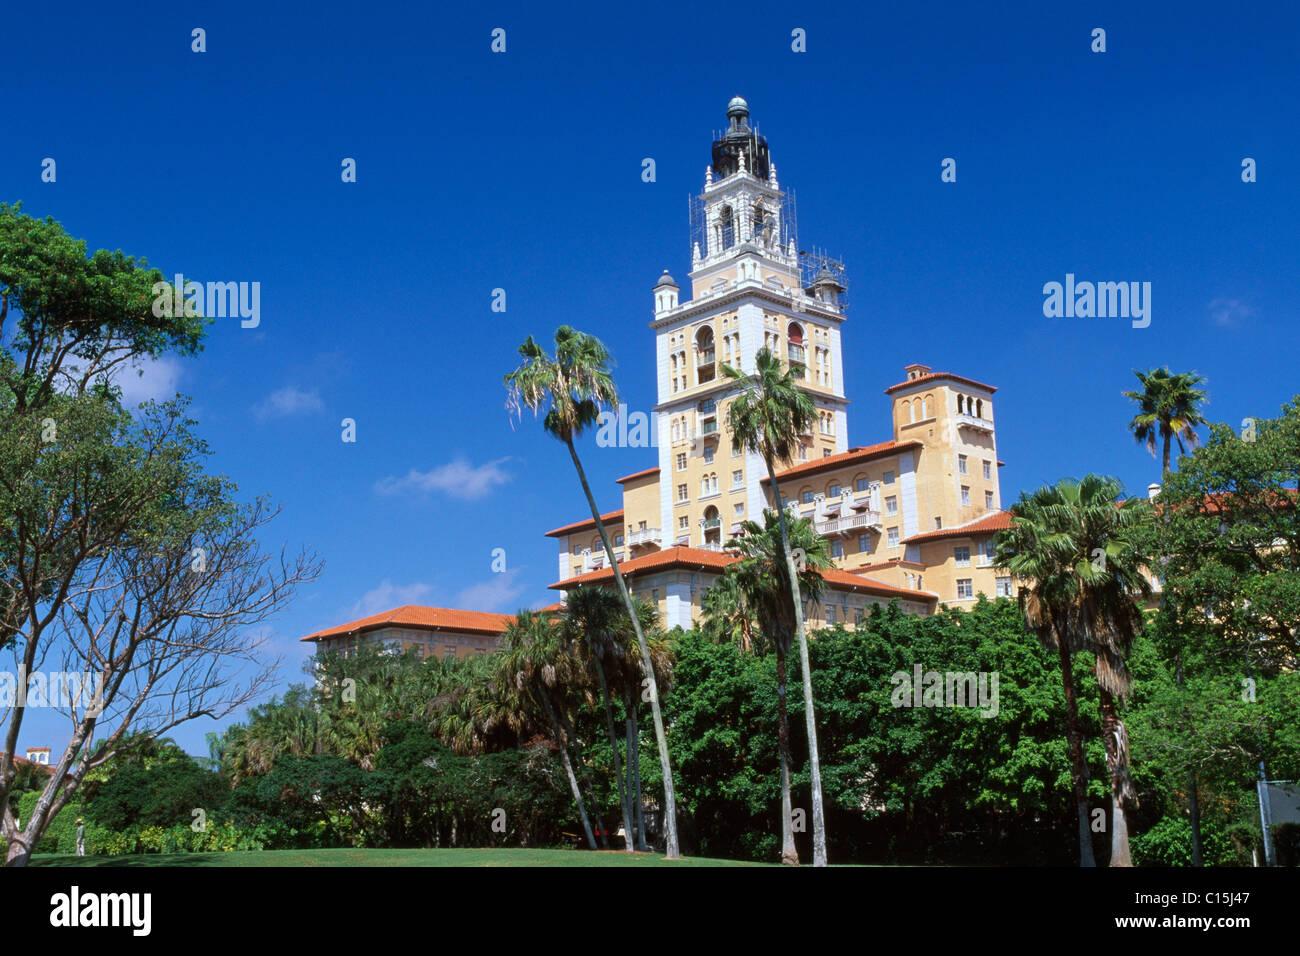 Biltmore Hotel, Coral Gables, Miami, Florida, USA - Stock Image